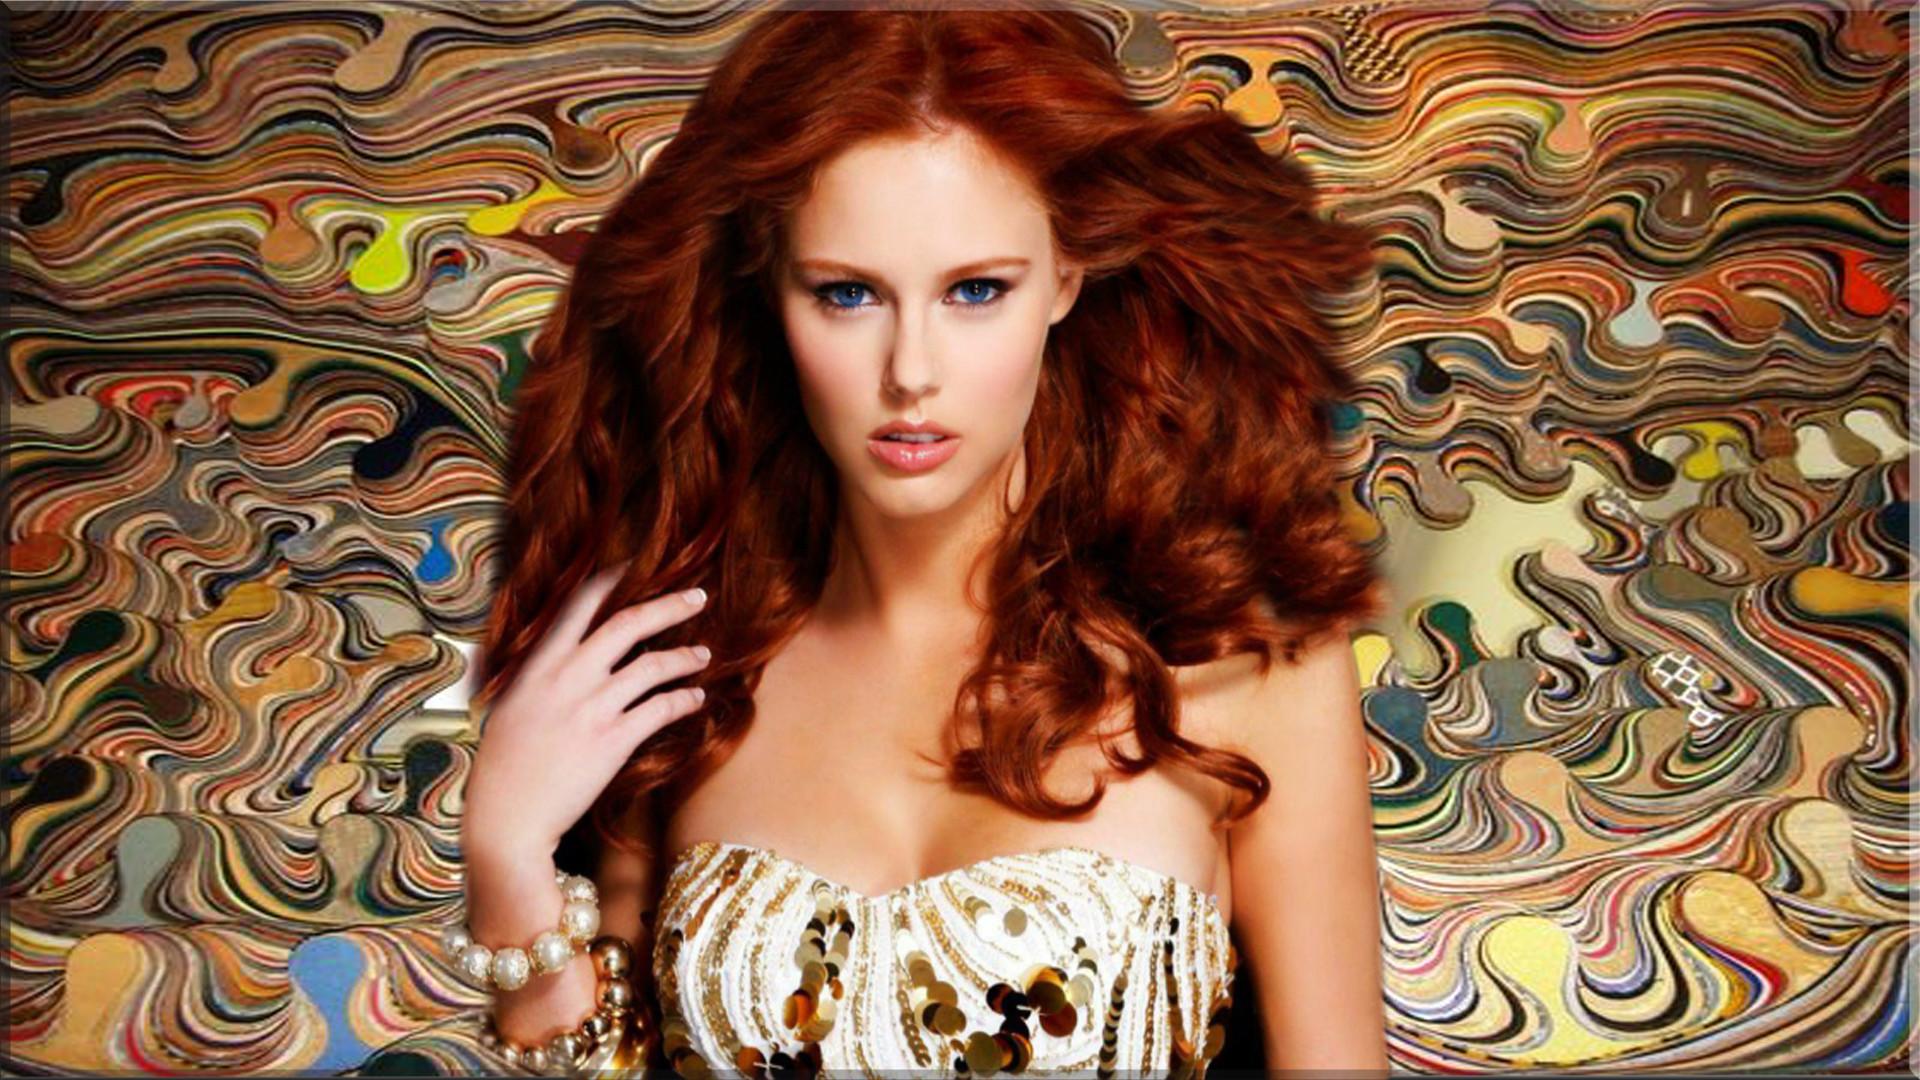 Women – Alyssa Campanella Redhead Woman Model Wallpaper